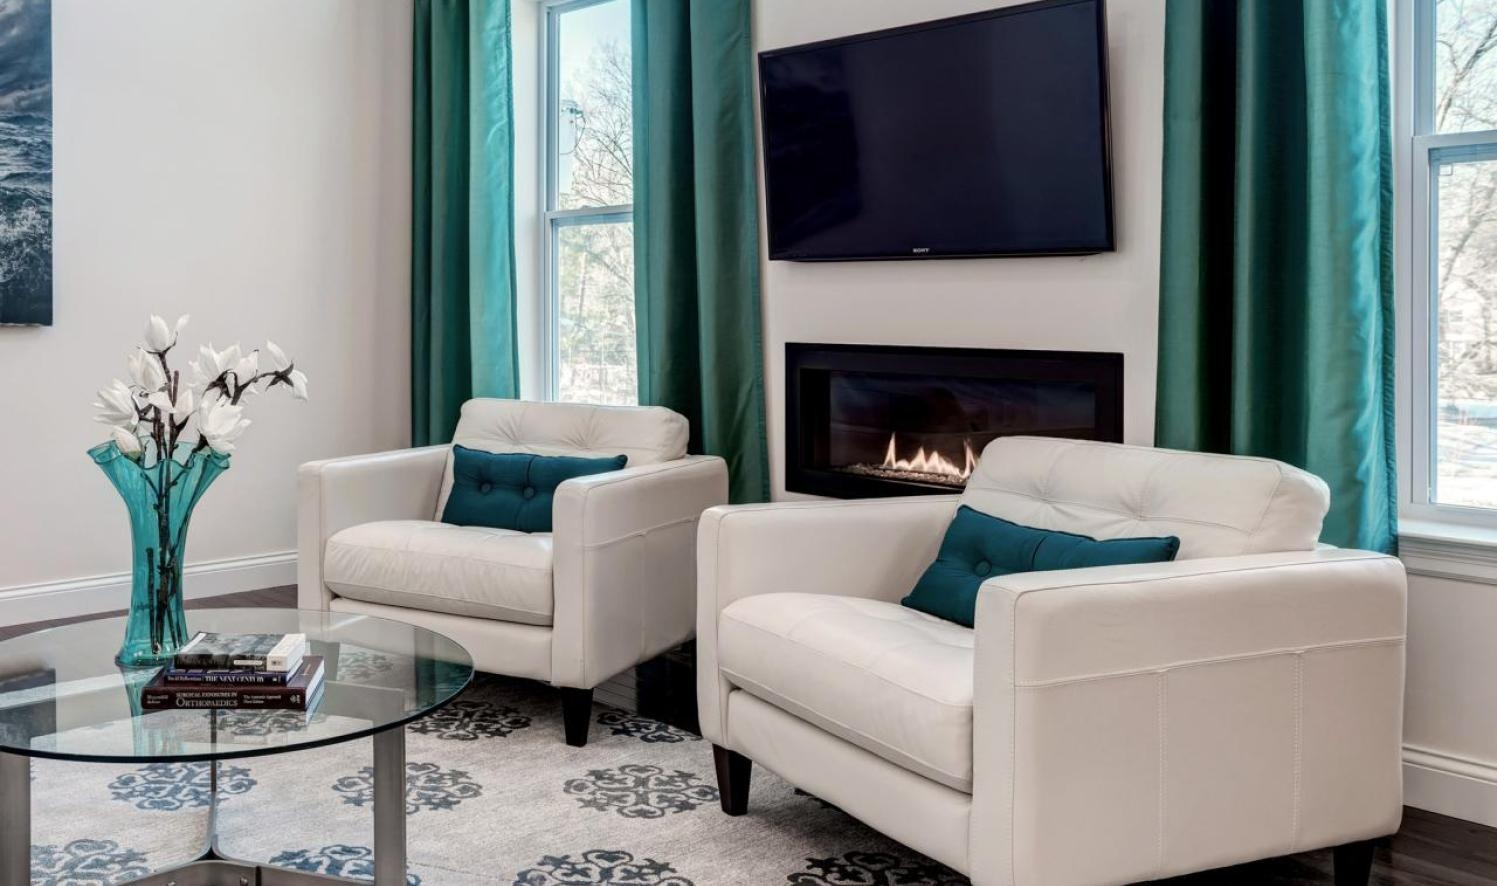 Sofa : Wonderful Deep Cushion Sofa Gallery Of The Avoiding For Deep Cushioned Sofas (View 18 of 22)